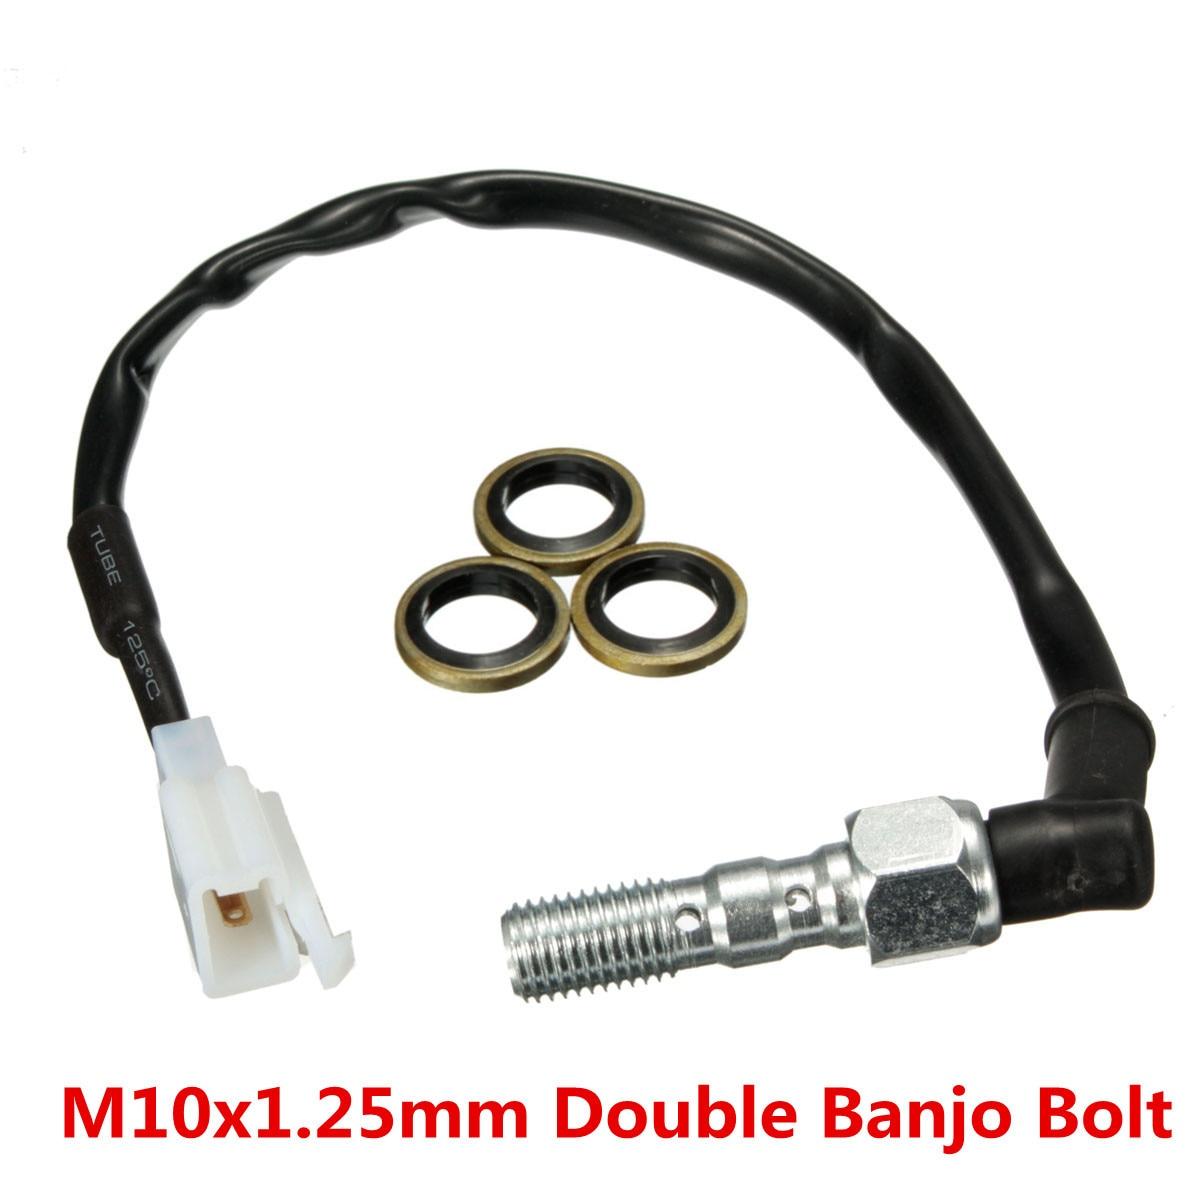 Motorcycle Hydraulic Double Banjo Bolt Brake Light Switch M10 x 1.25mm motorcycle hydraulic double banjo bolt brake light switch m10 x 1 00mm